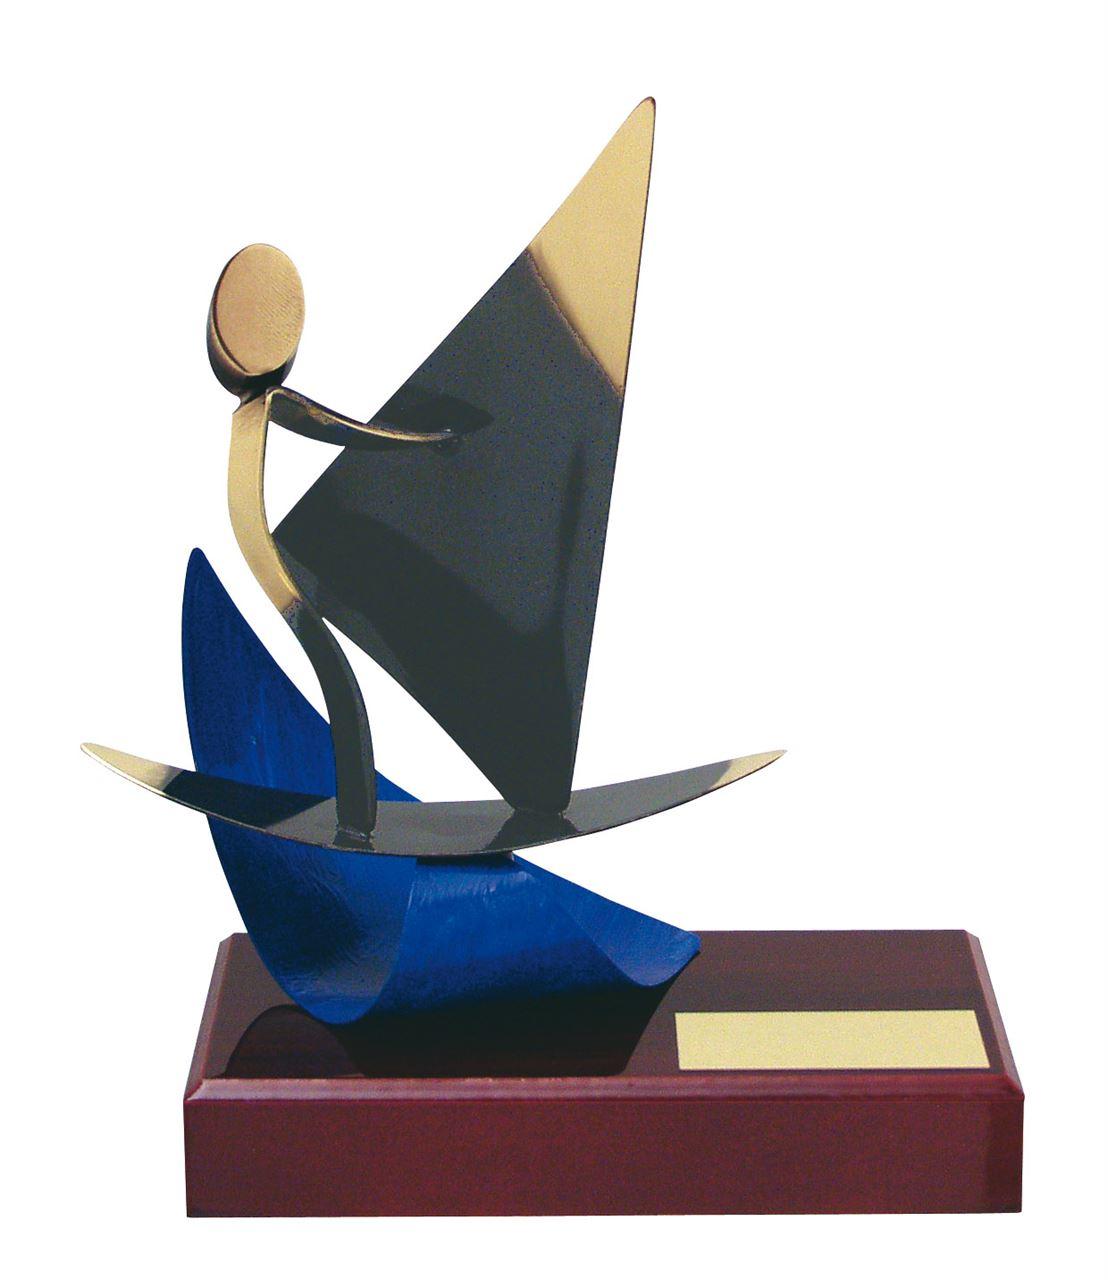 Windsurfing figure Handmade Metal Trophy - 300 WI